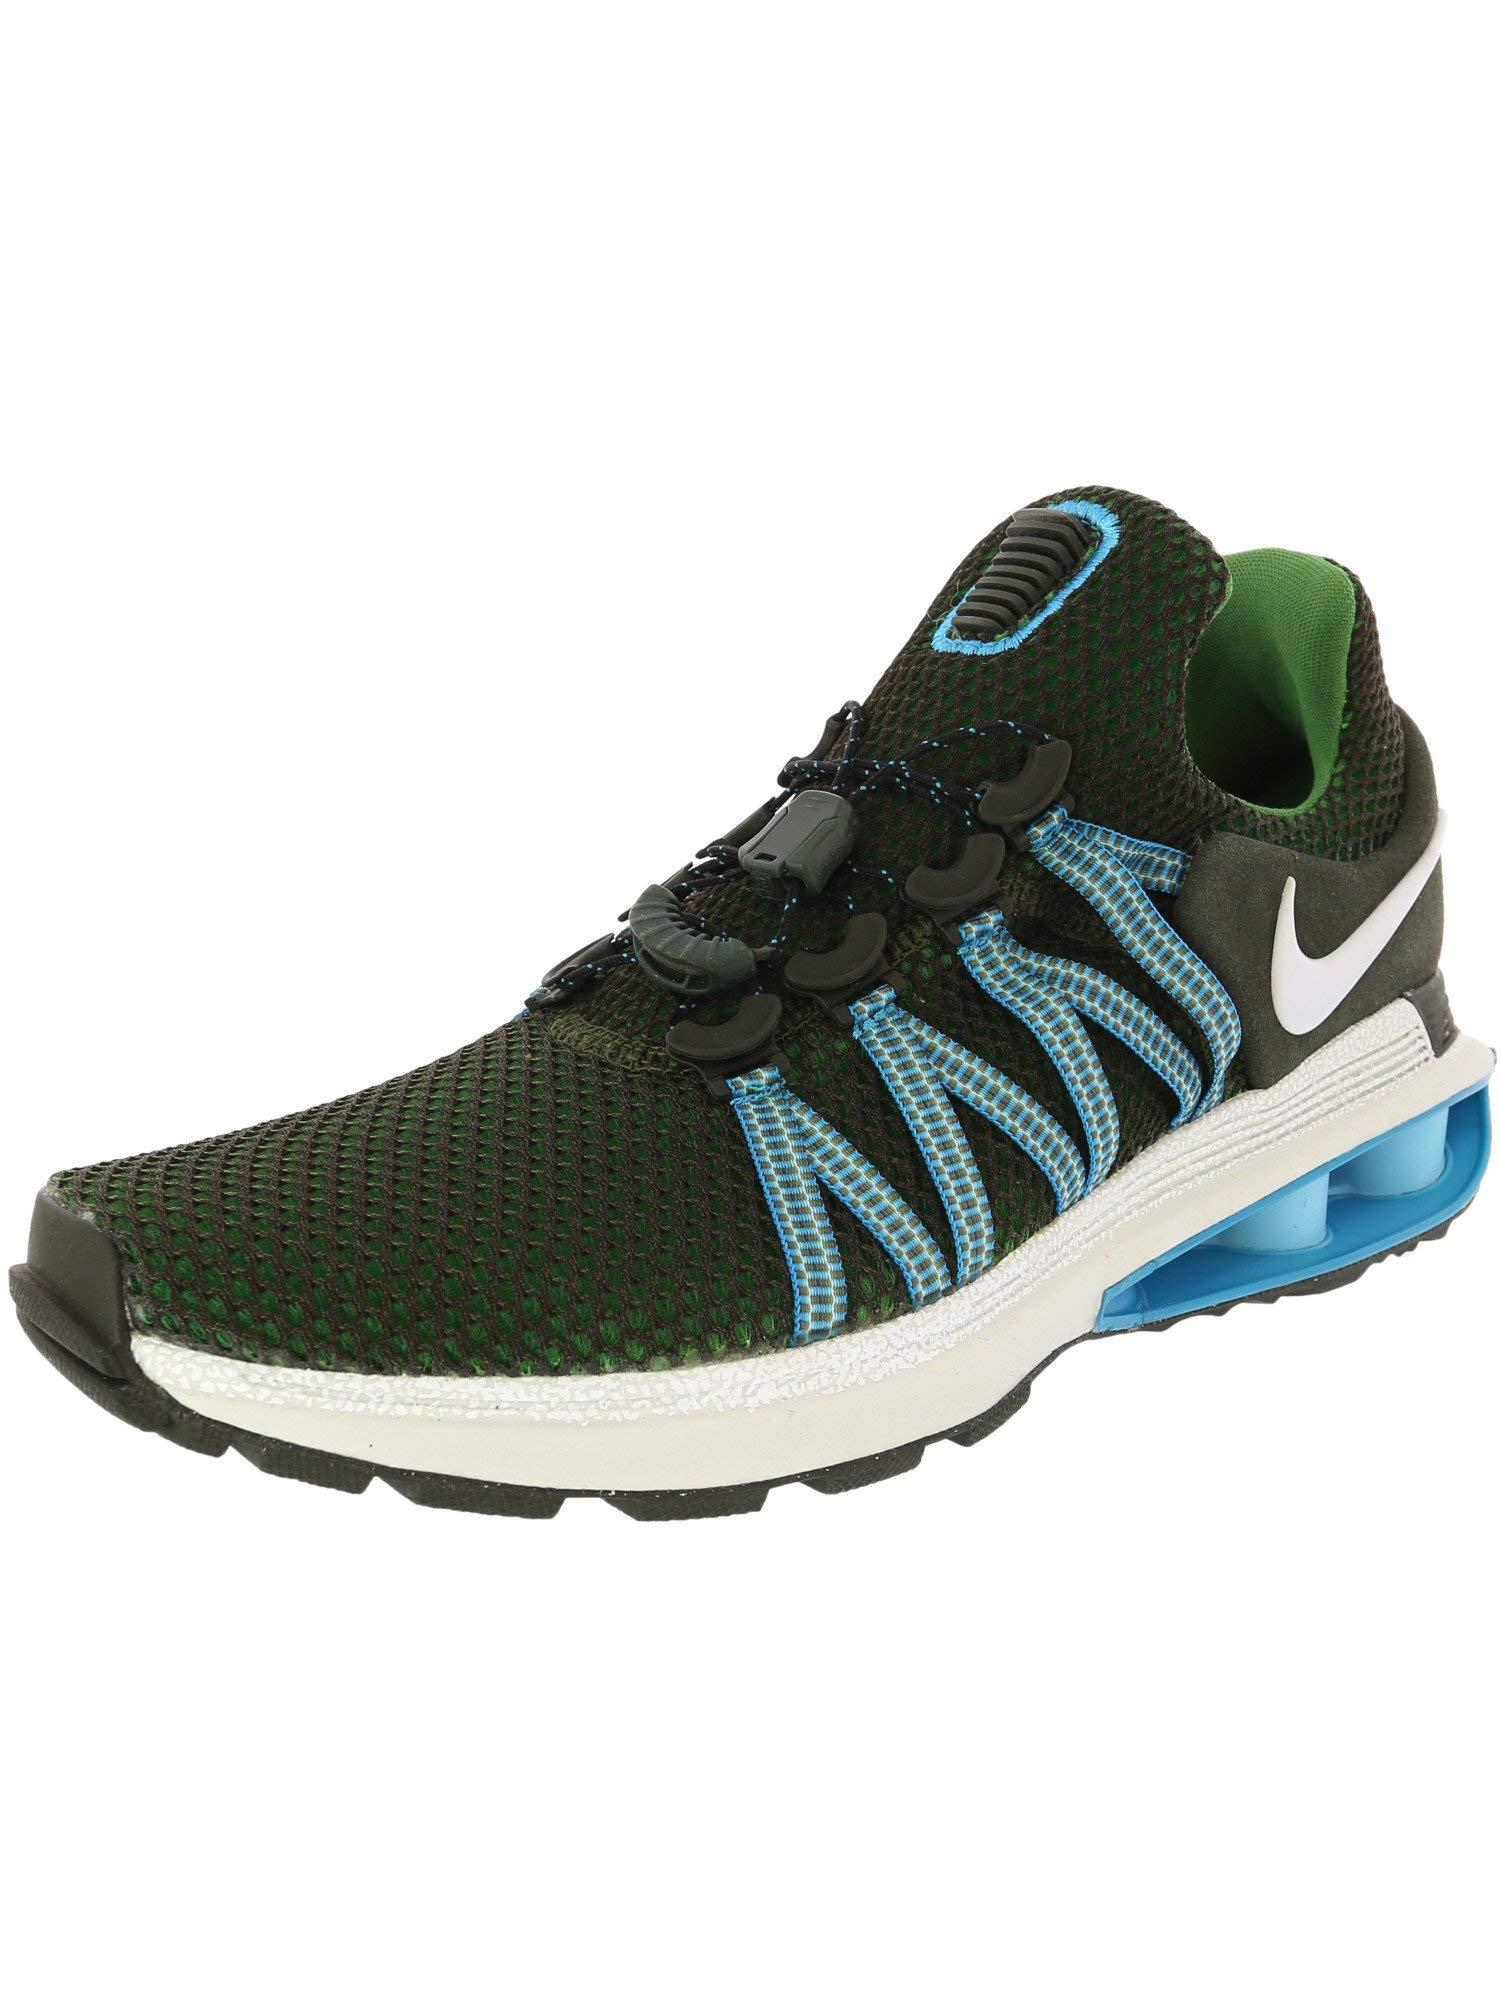 Nike Men's Shox Gravity Sequoia/White - Off Ankle-High Running Shoe 6M